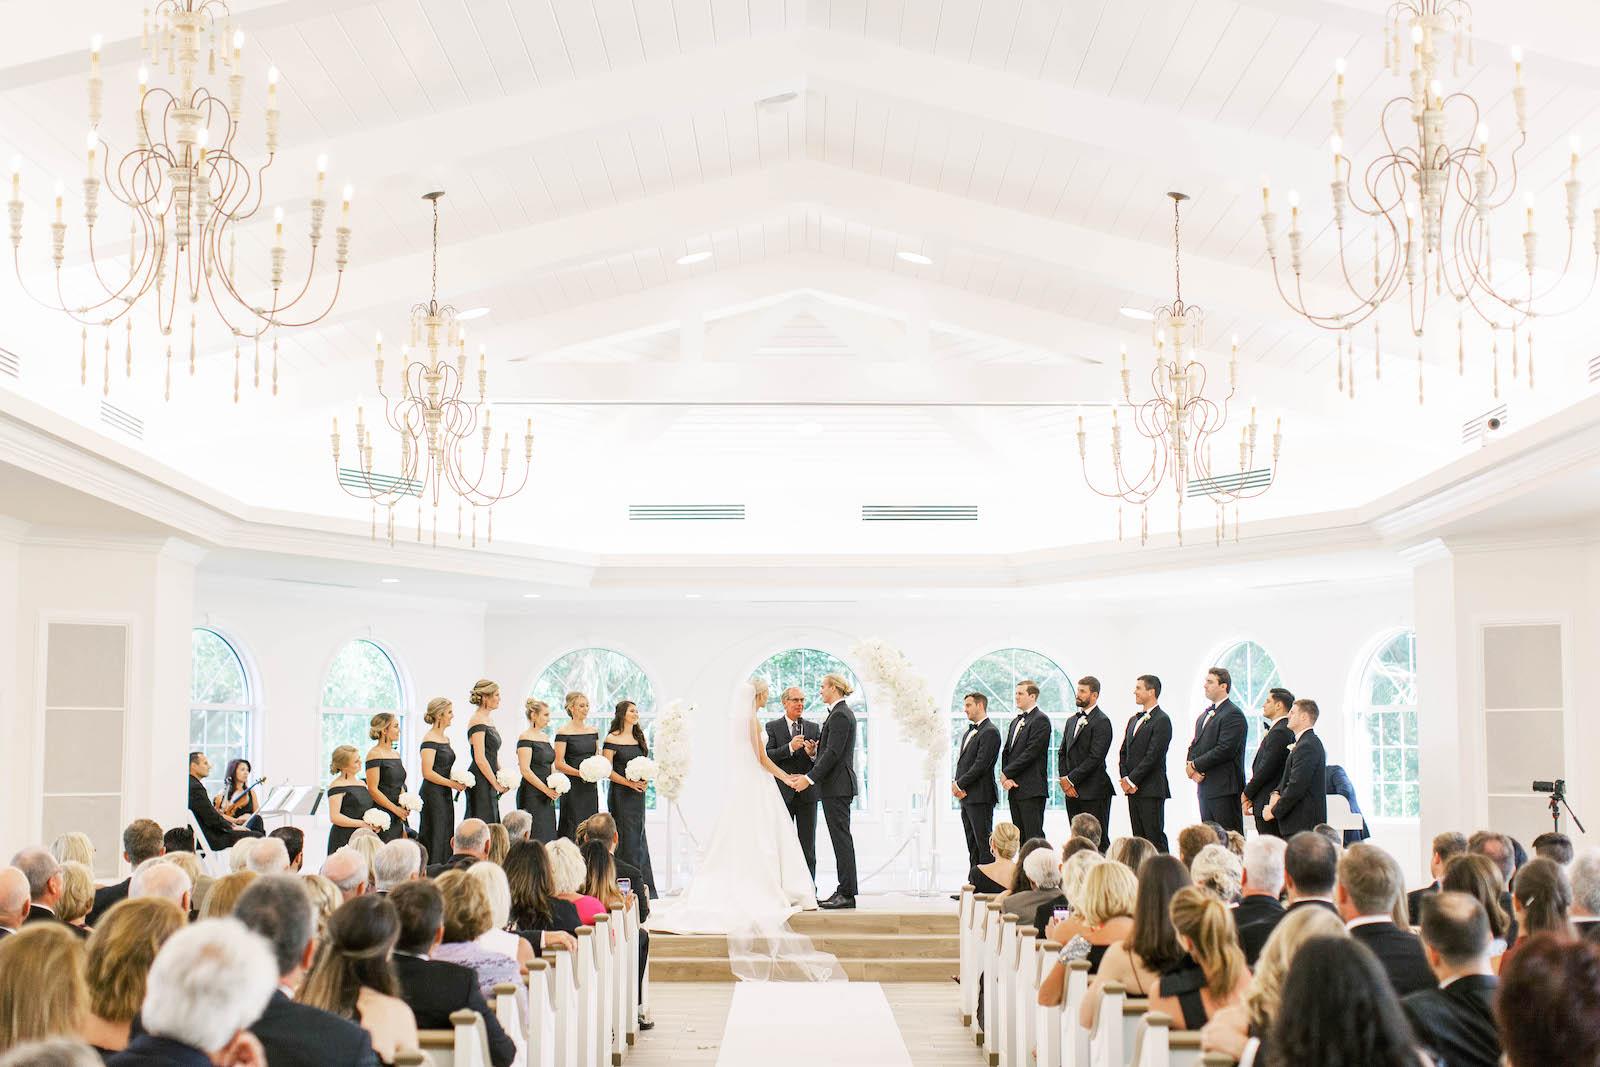 Classic Traditional Bride and Groom Exchanging Wedding Ceremony Vows | Tampa Bay Wedding Planner Parties A'la Carte | Safety Harbor Church Wedding Venue Harborside Chapel